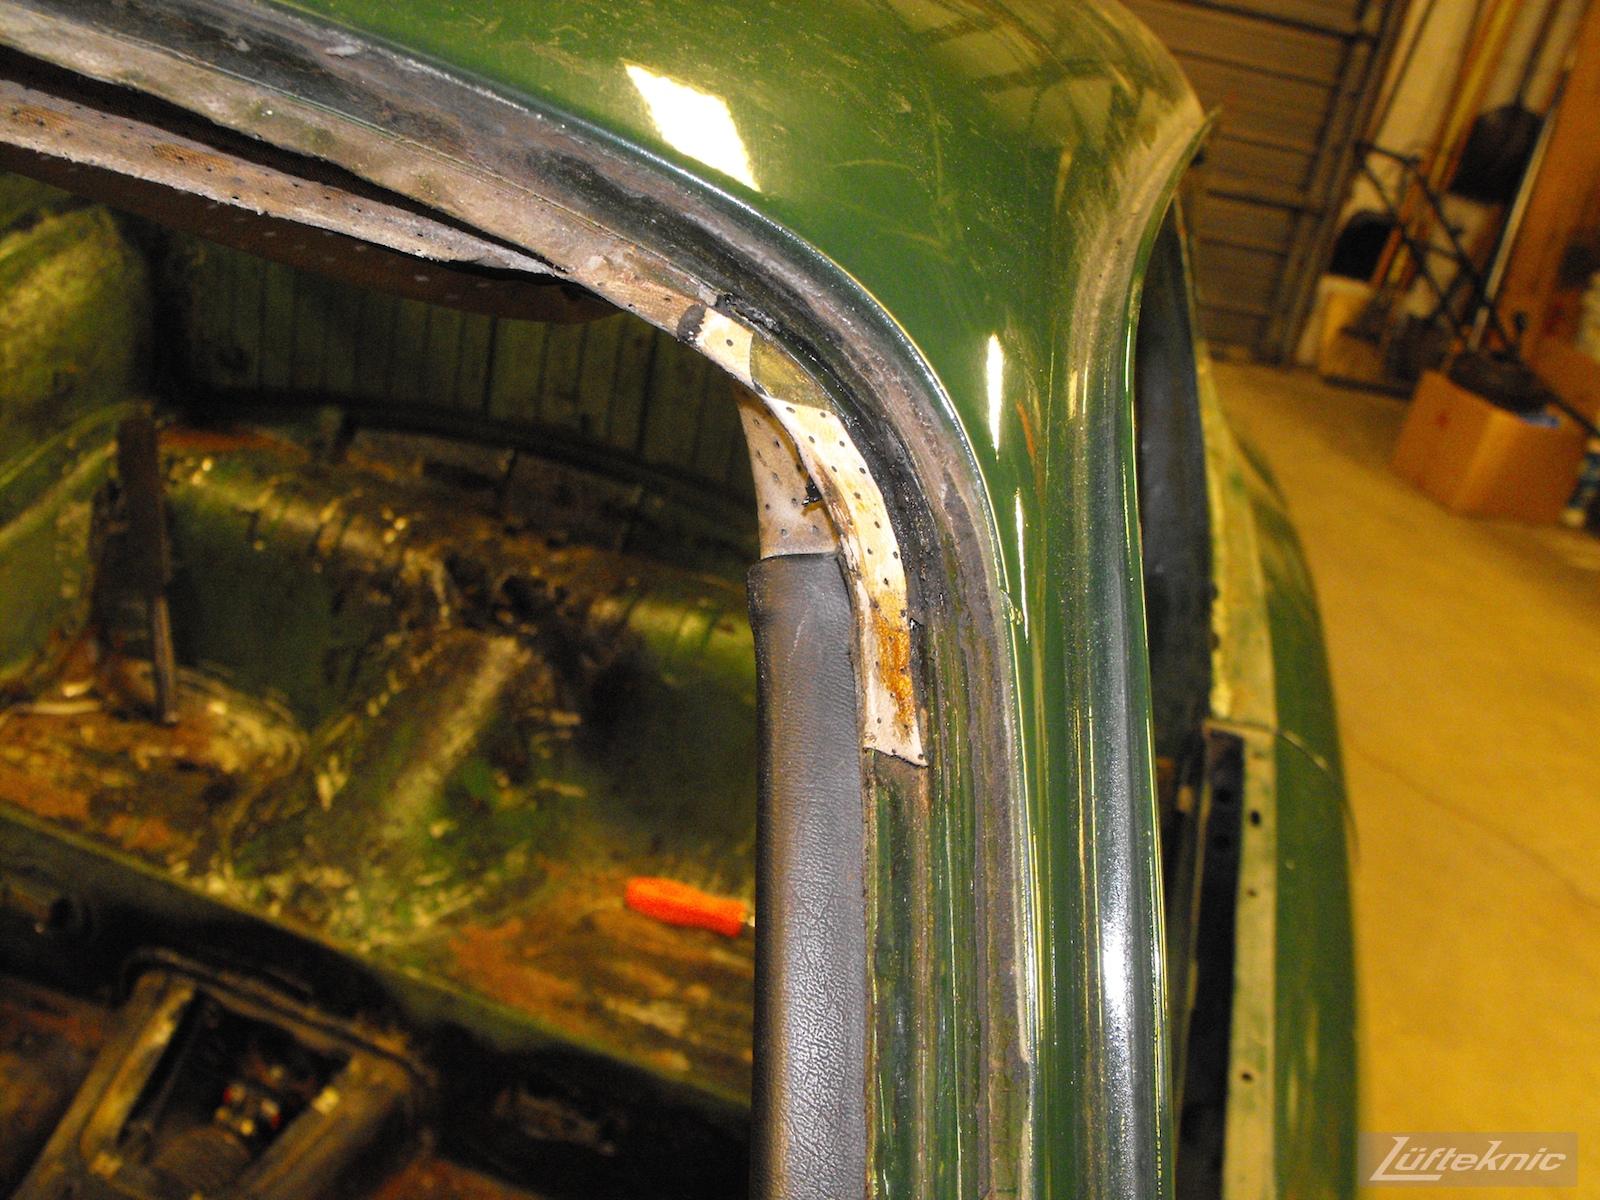 Upper headliner detail with the windshield removed on an Irish Green Porsche 912 undergoing restoration at Lufteknic.